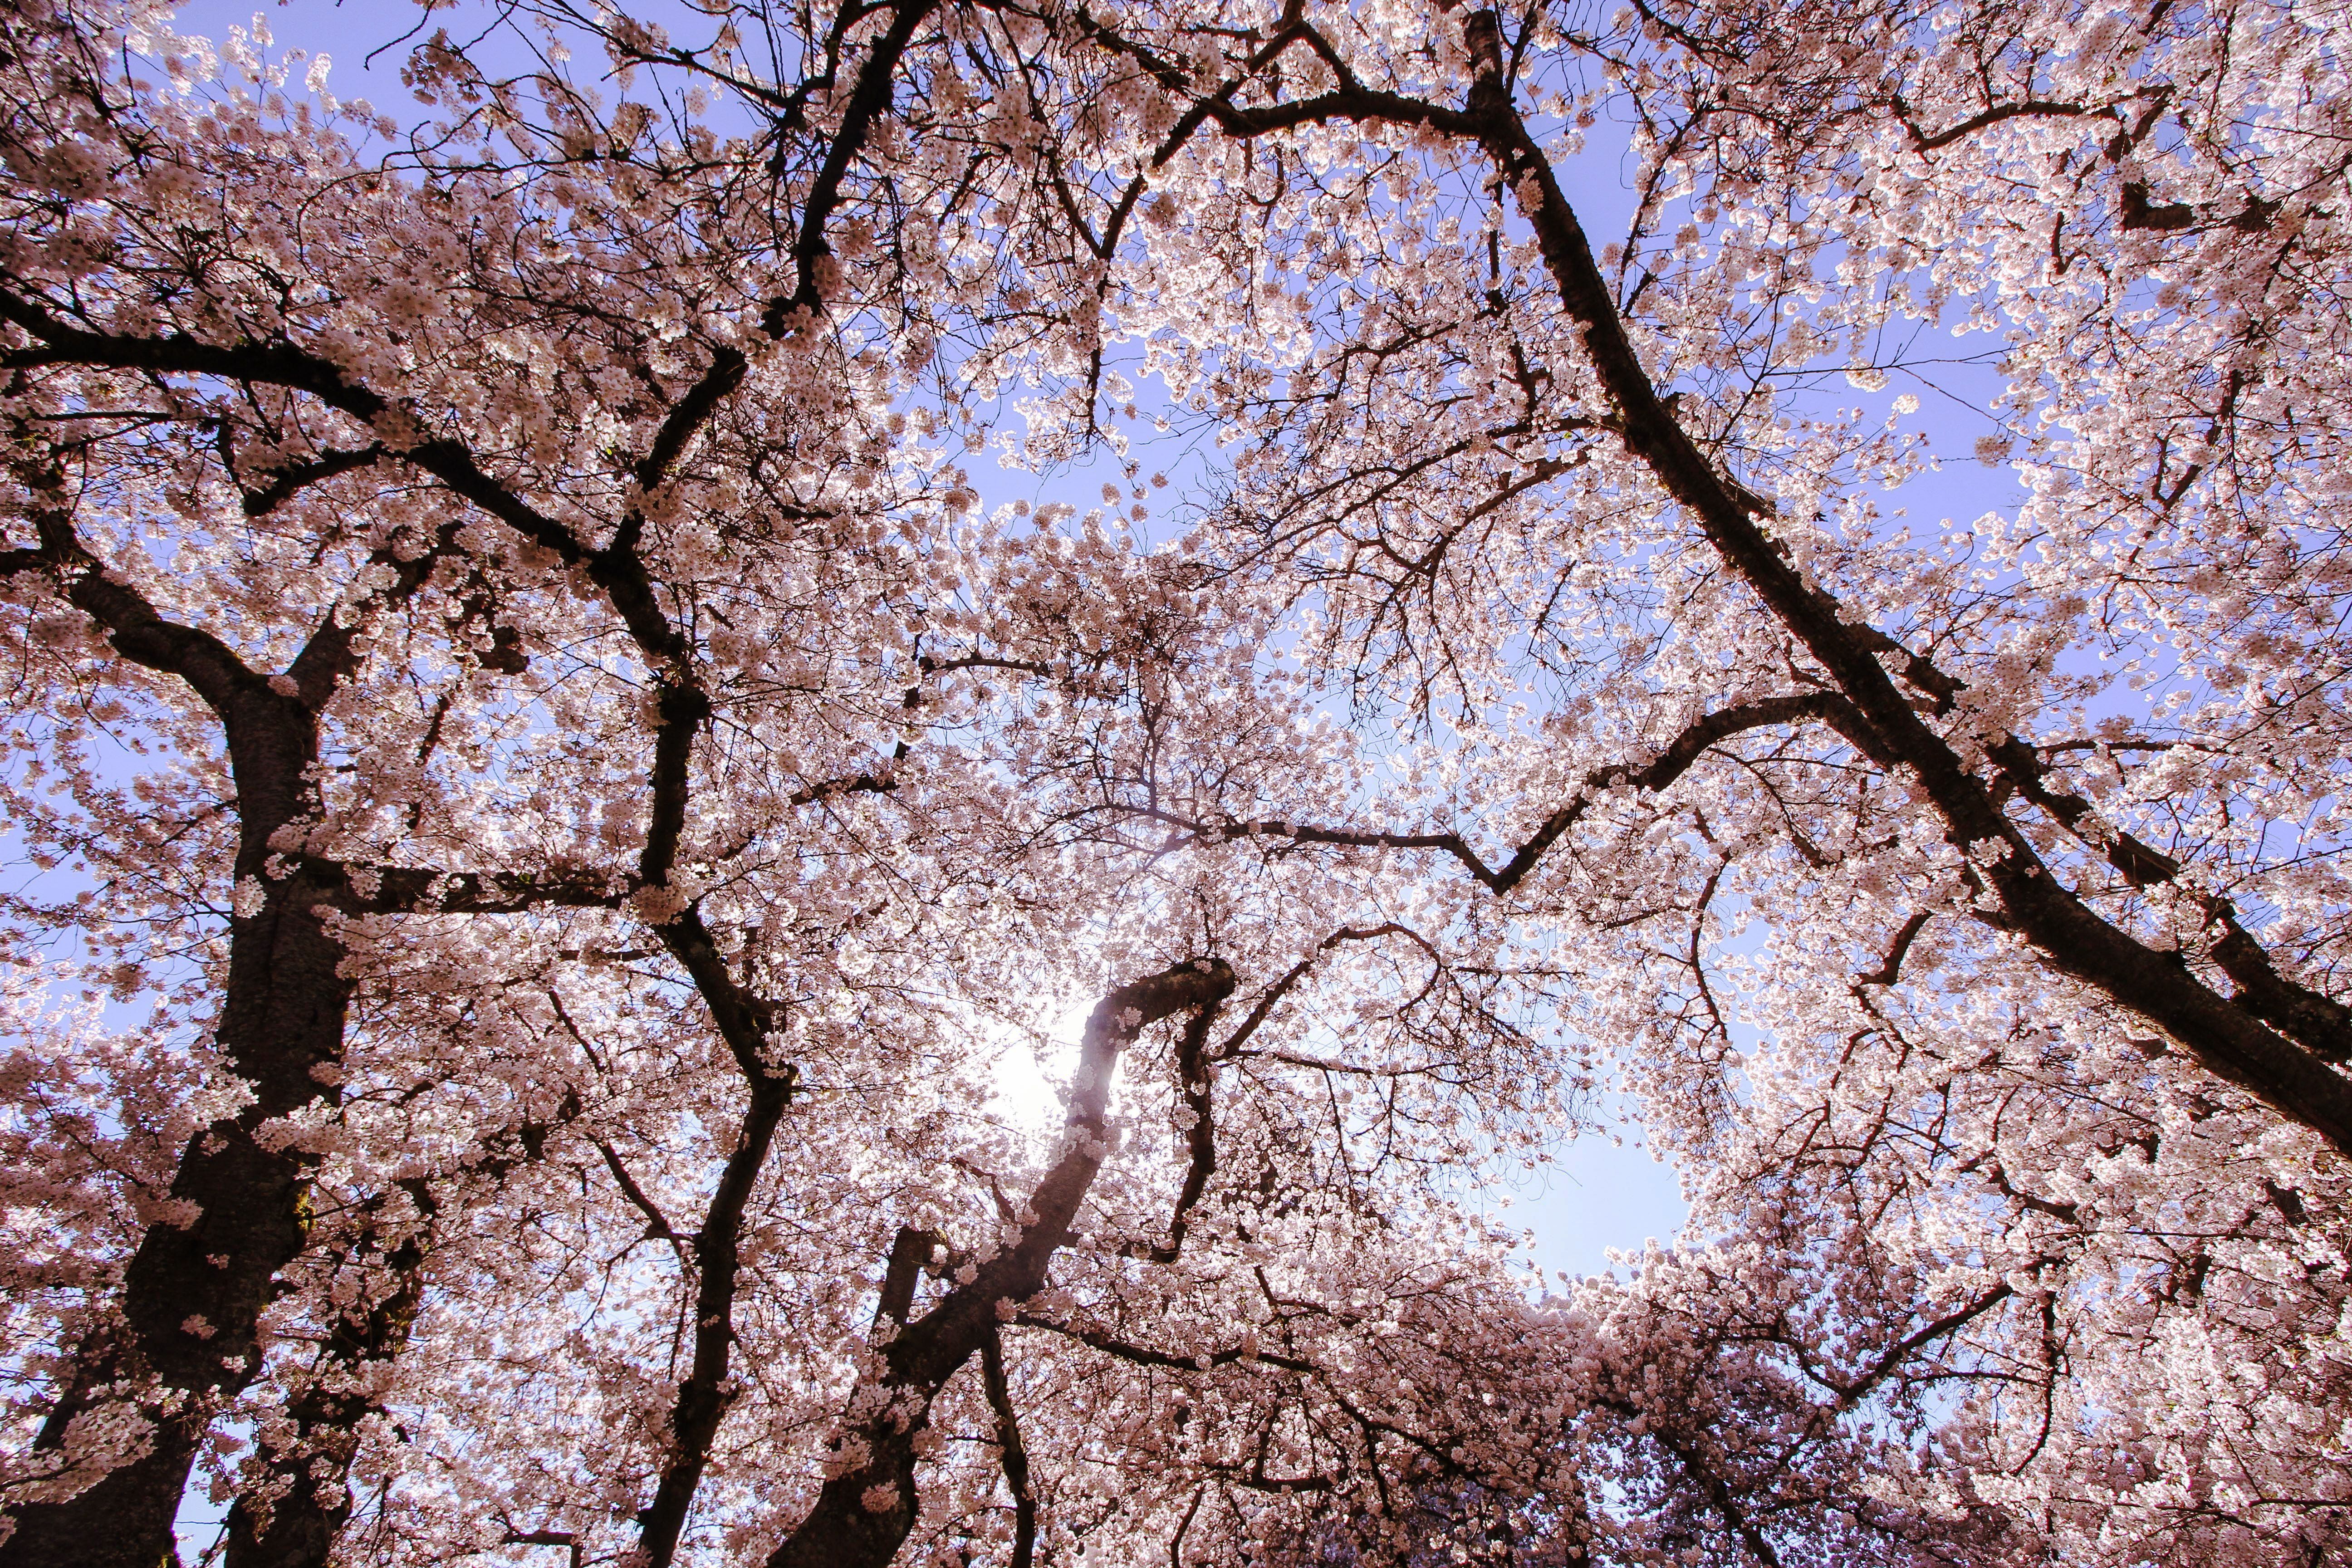 Cherry Blossoms at University of Washington